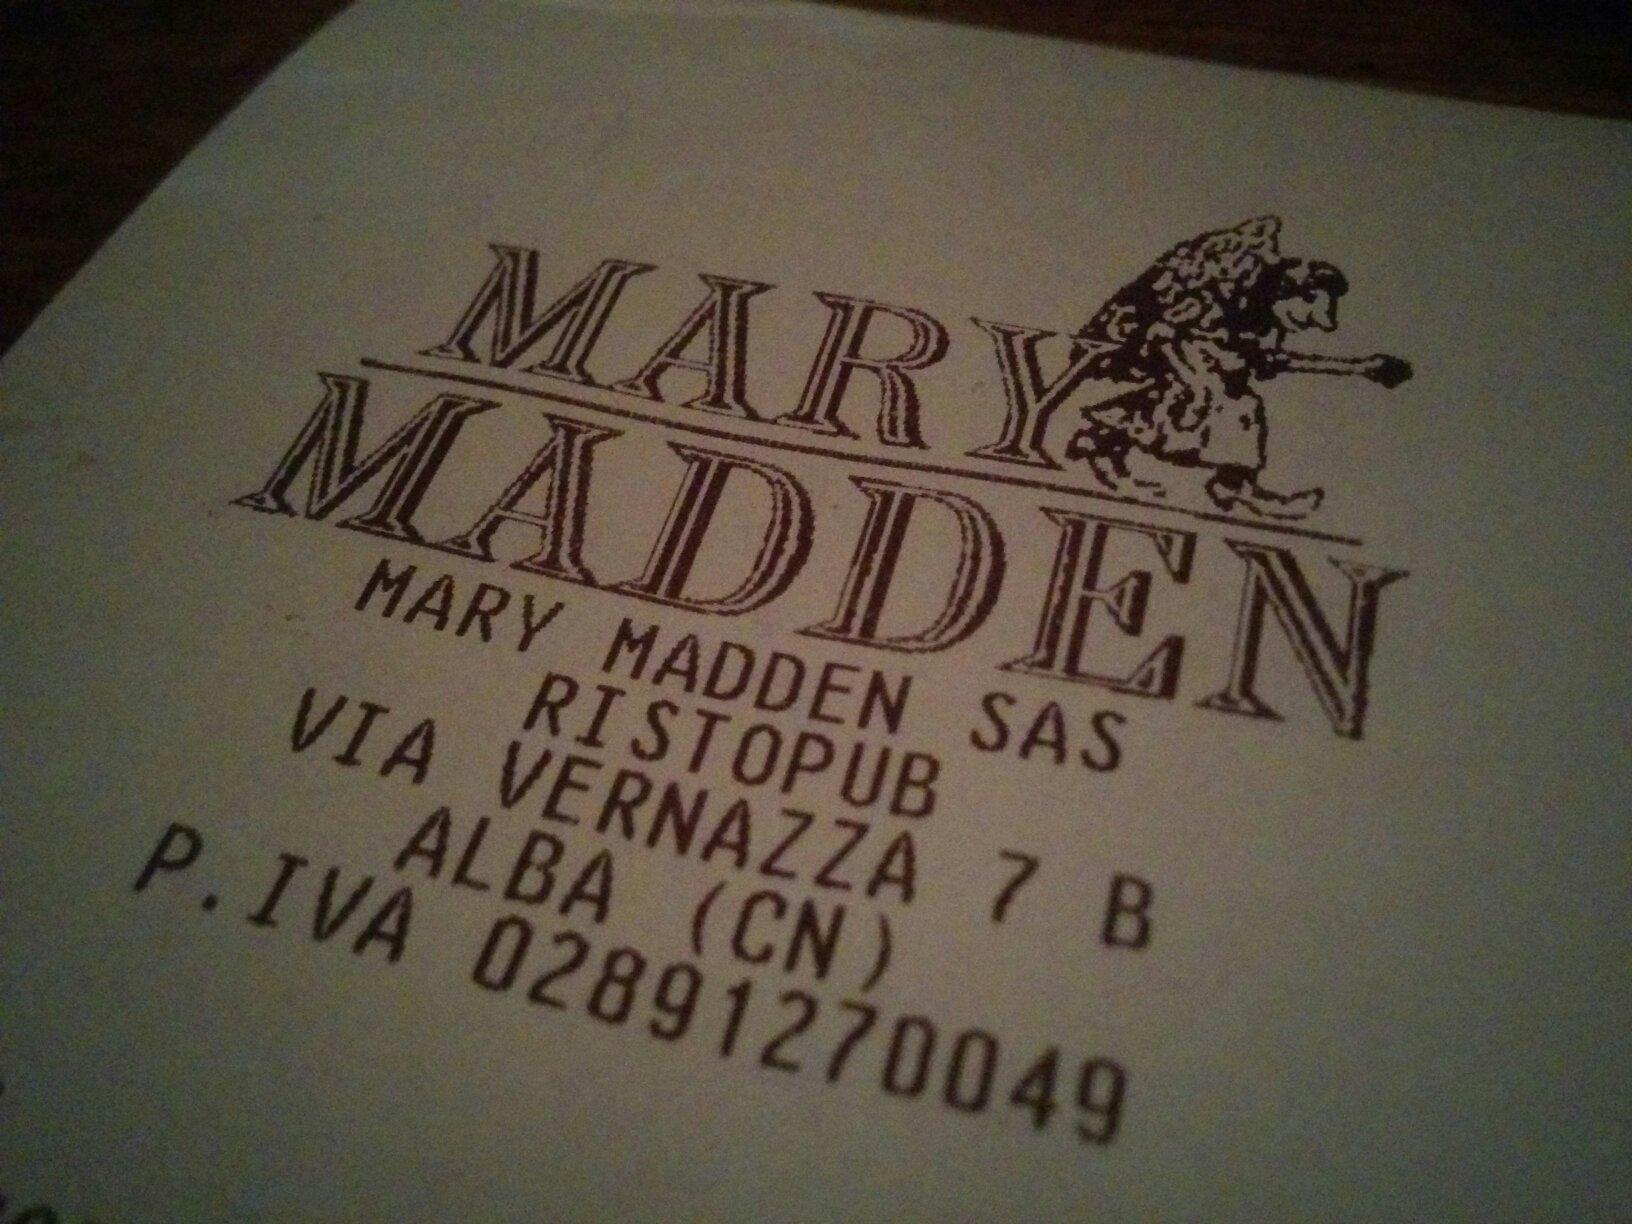 Mary Madden Irish Pub